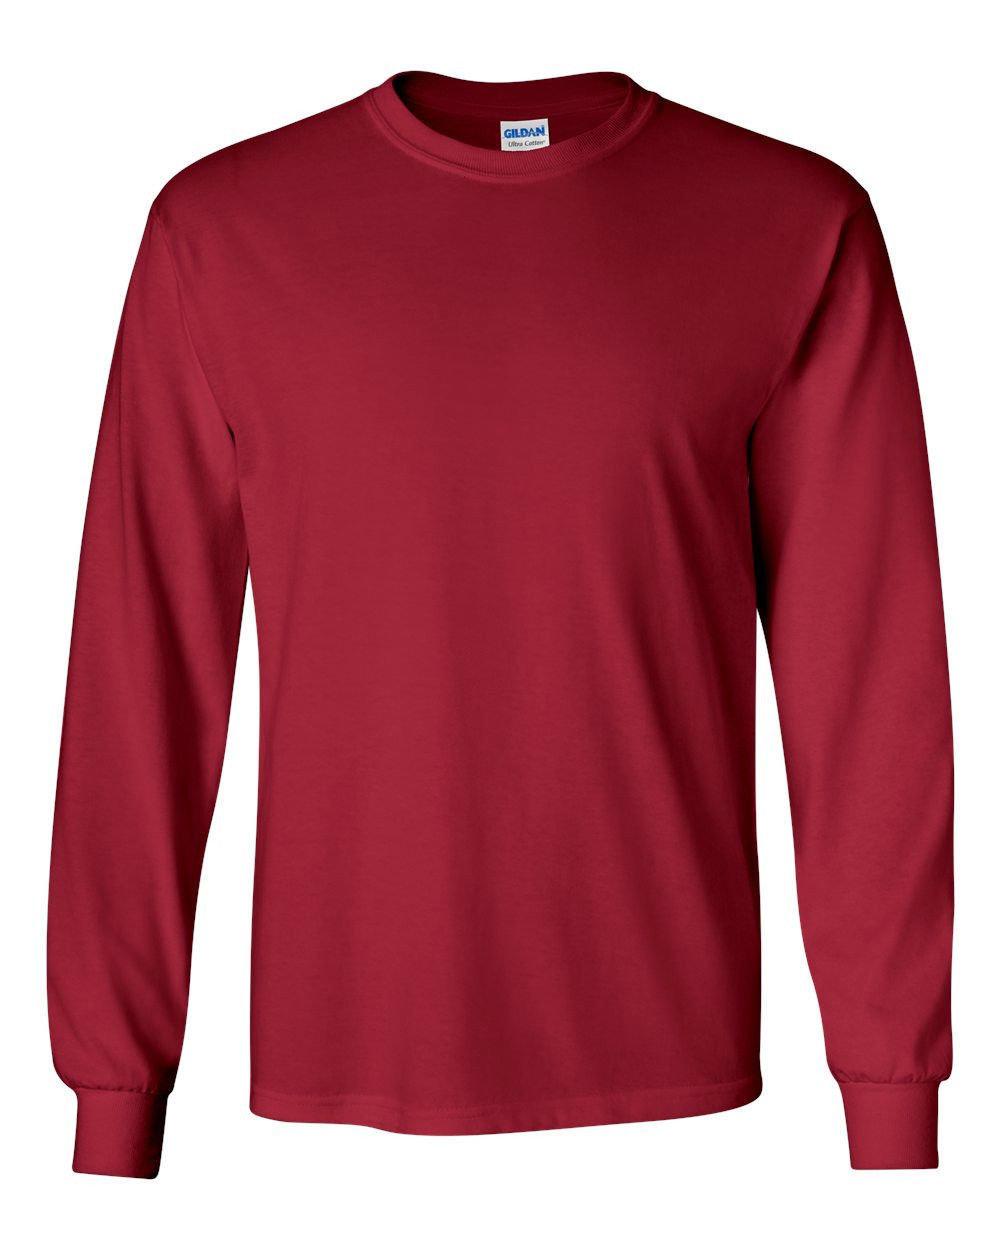 Gildan Long Sleeve Shirt with Logo